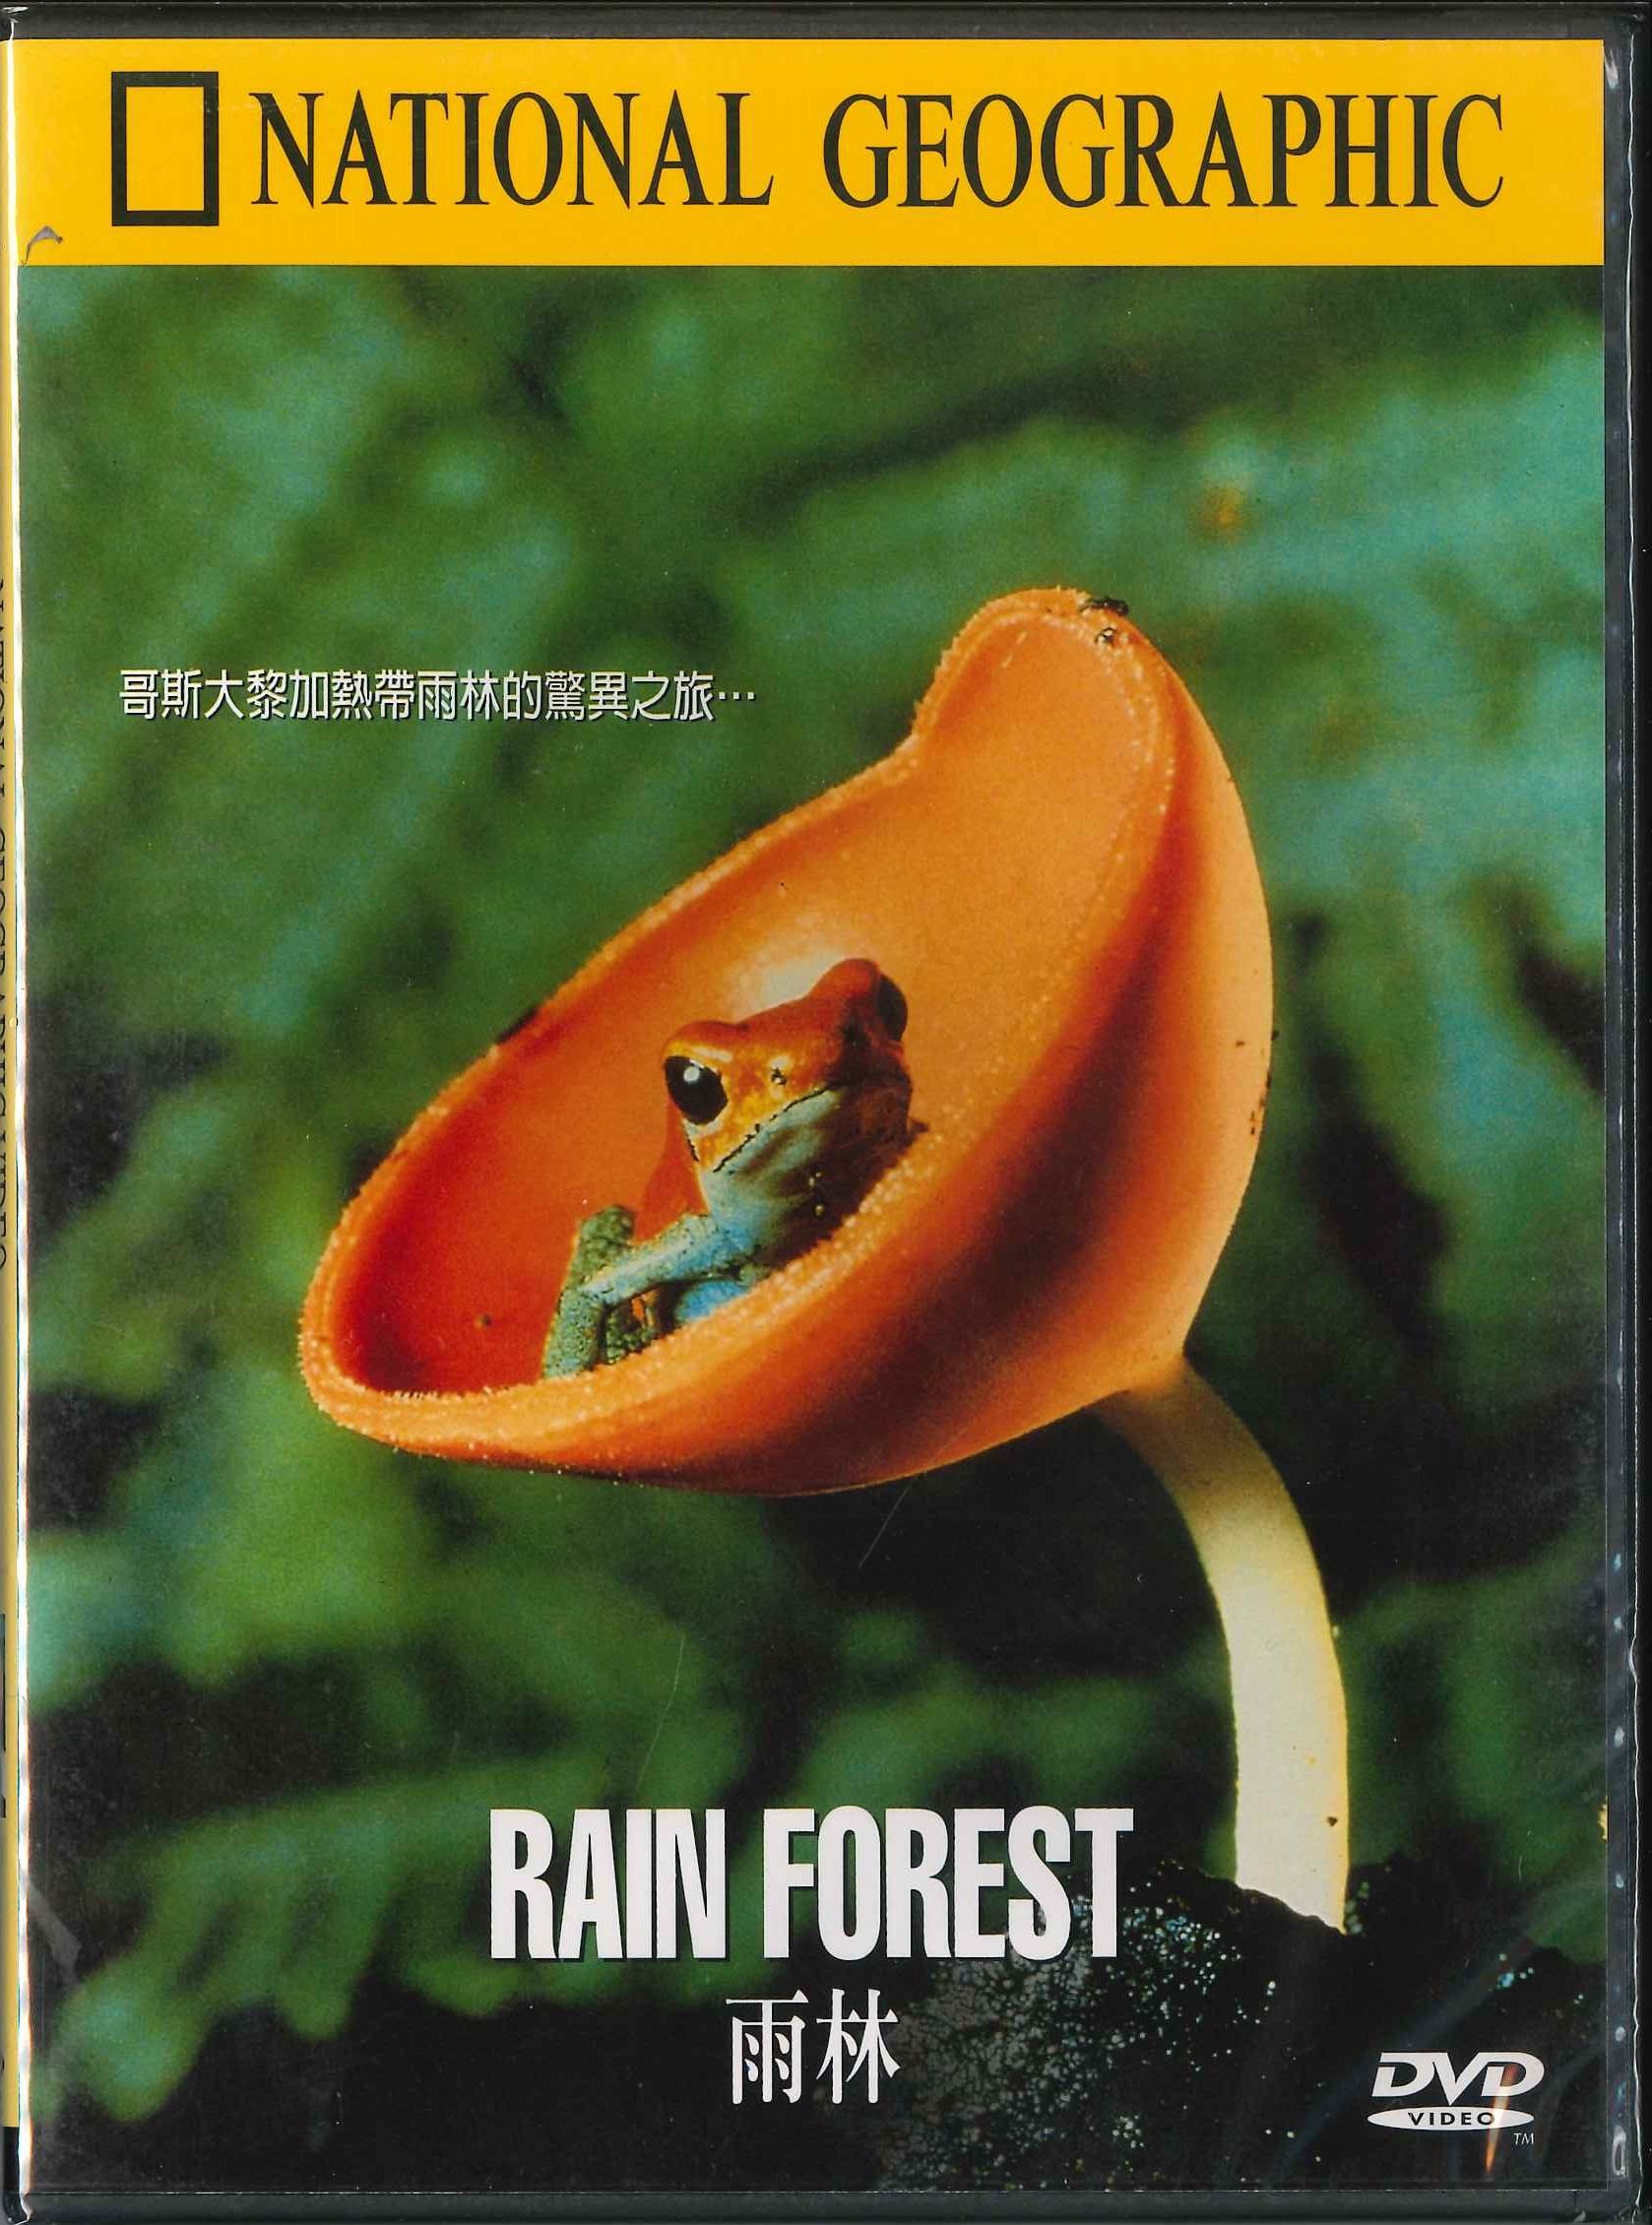 雨林 [錄影資料]=Rain forest